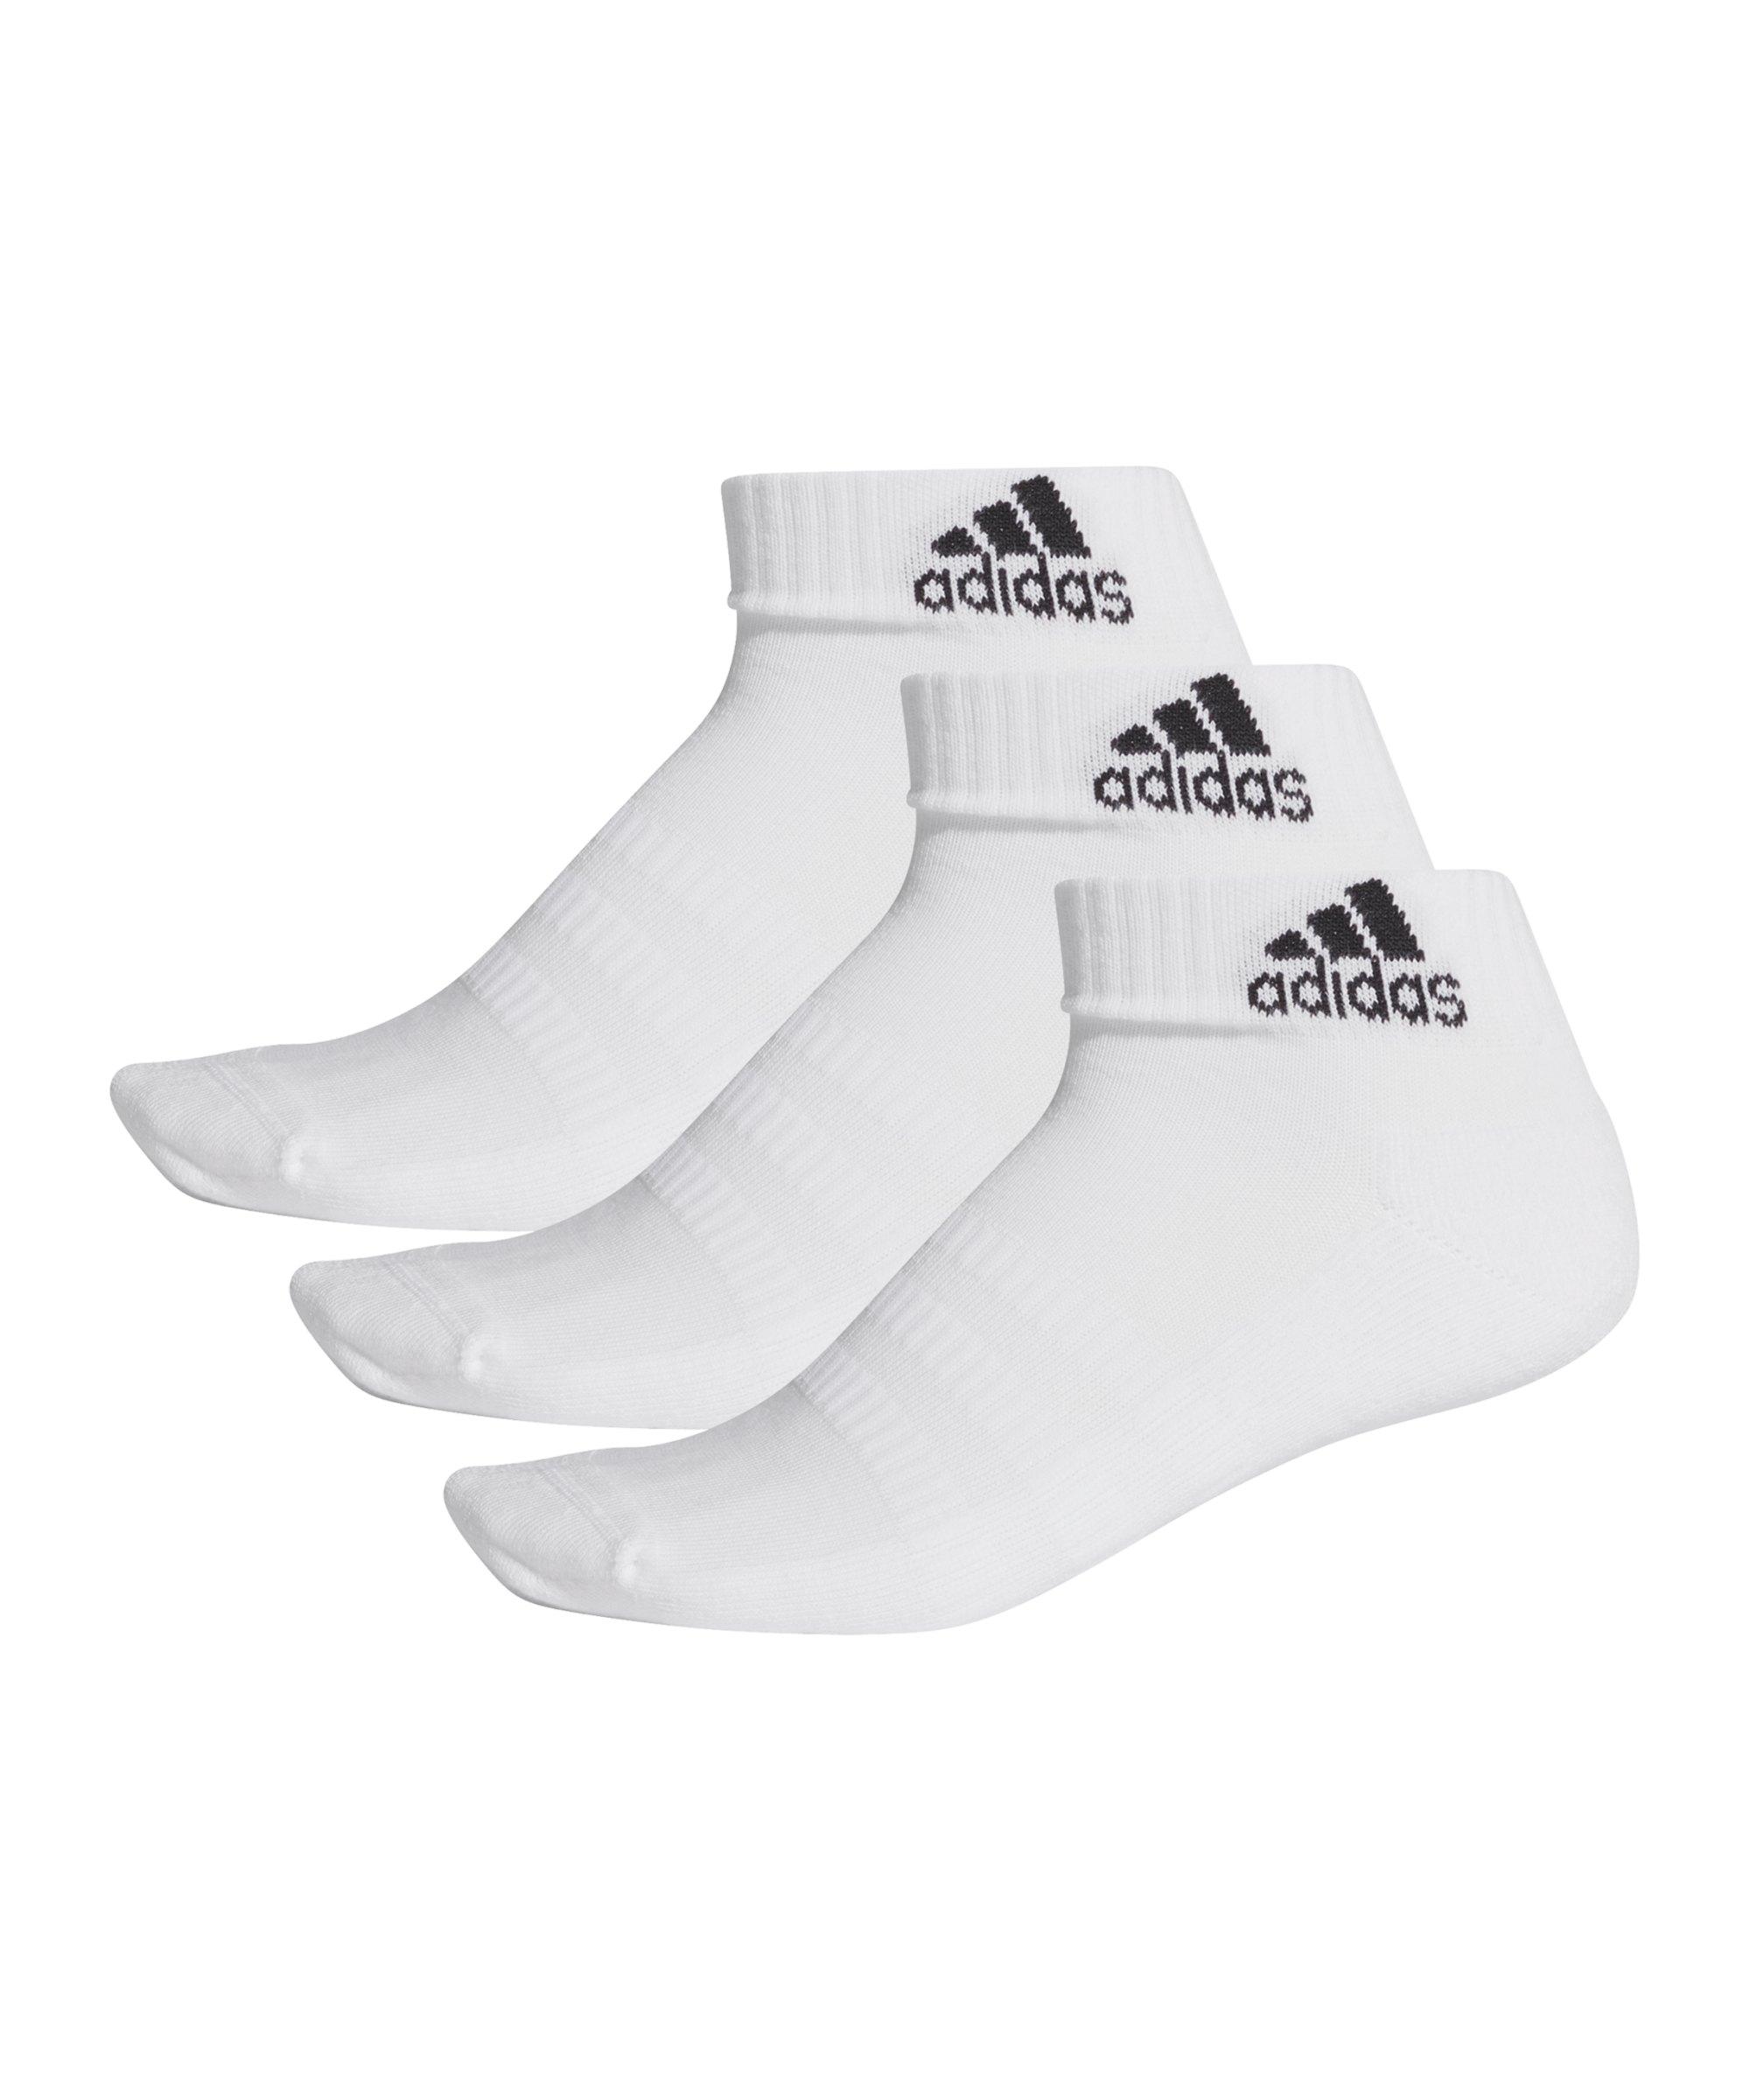 adidas Cushioned Ankle Socken 3er Pack Weiss - weiss